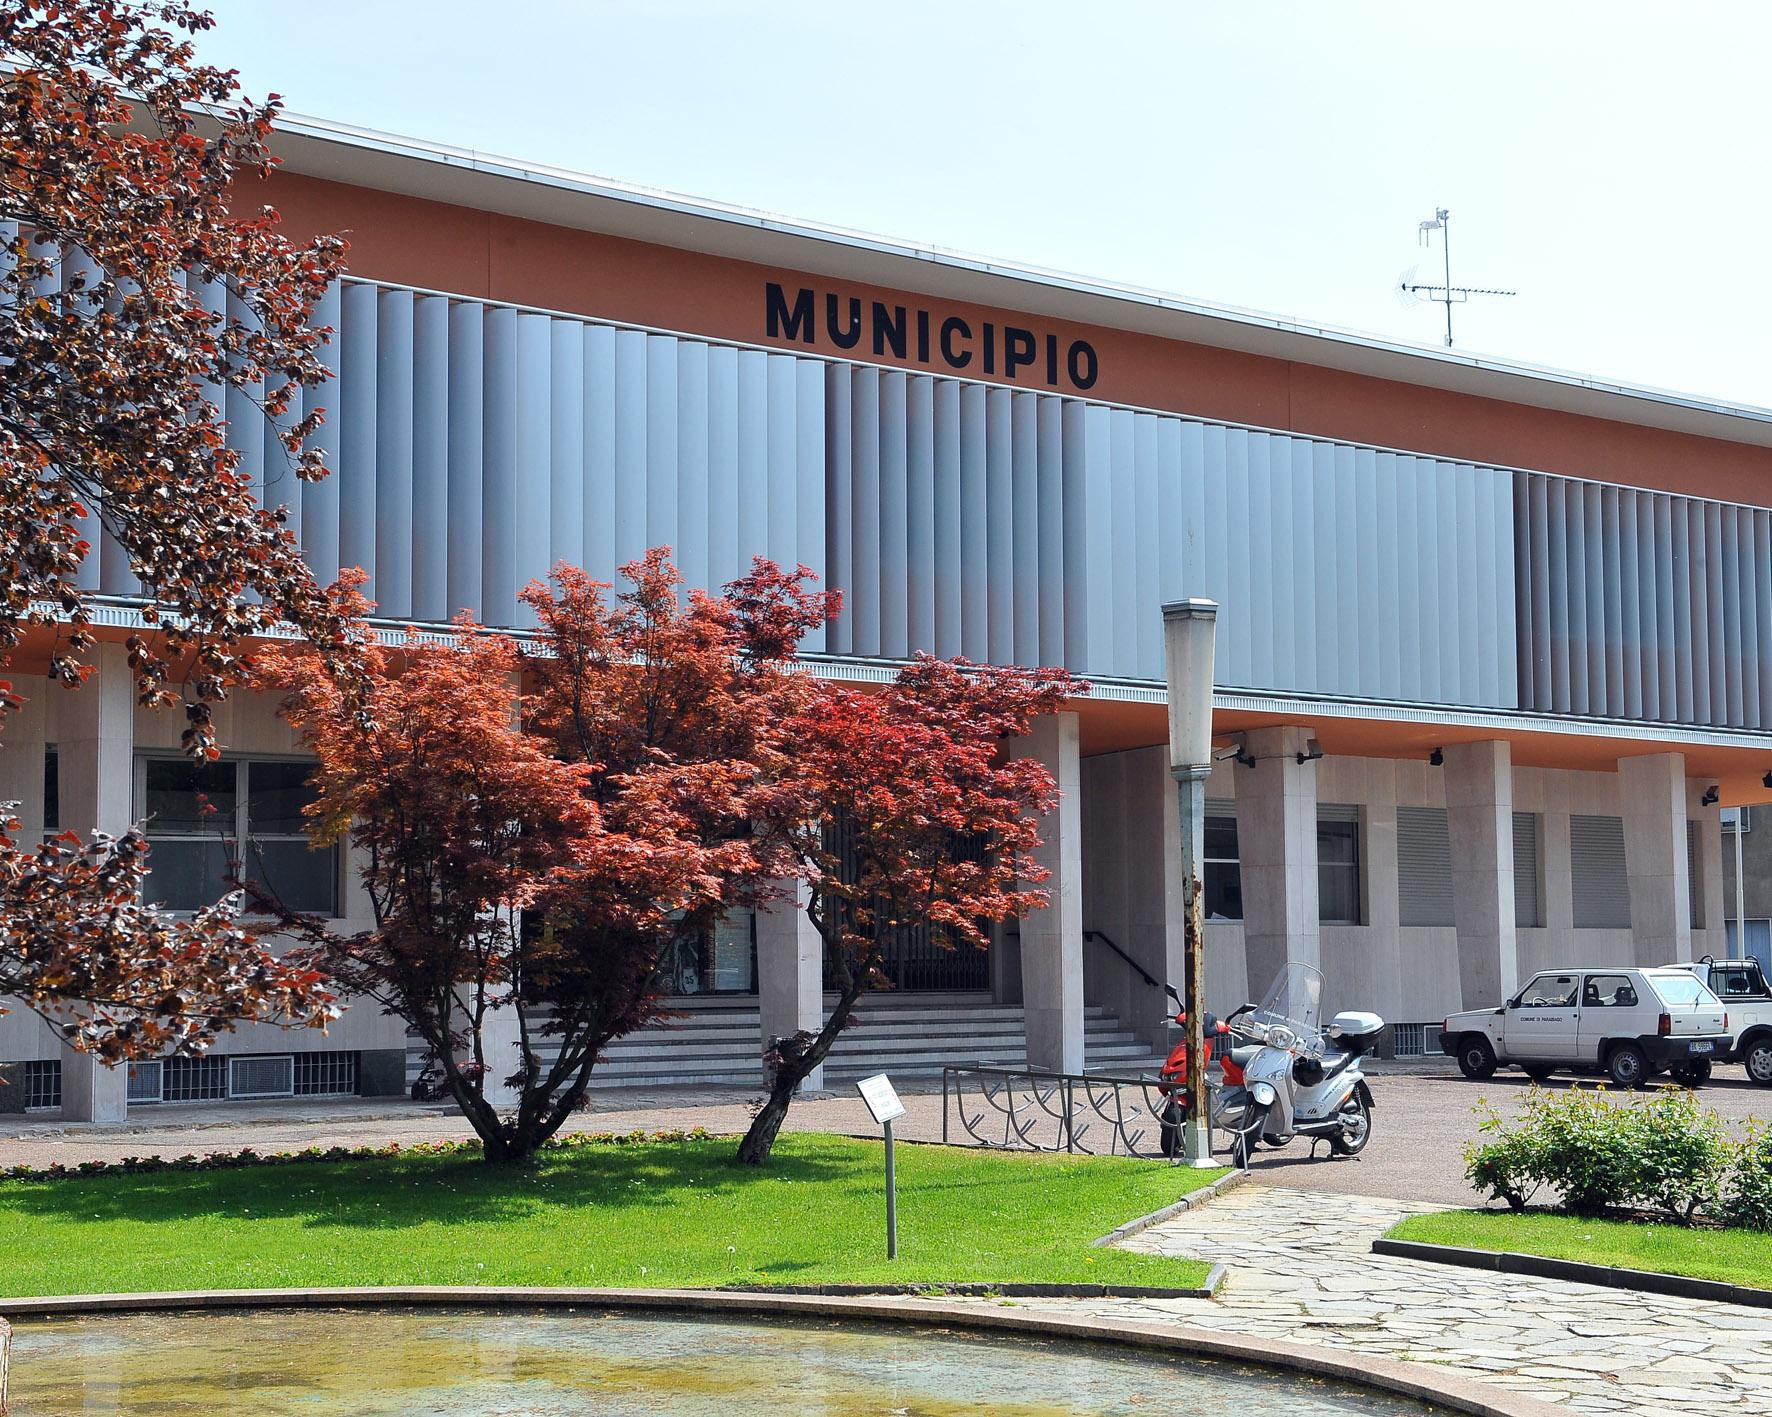 Elezioni Parabiago 2020 Municipio